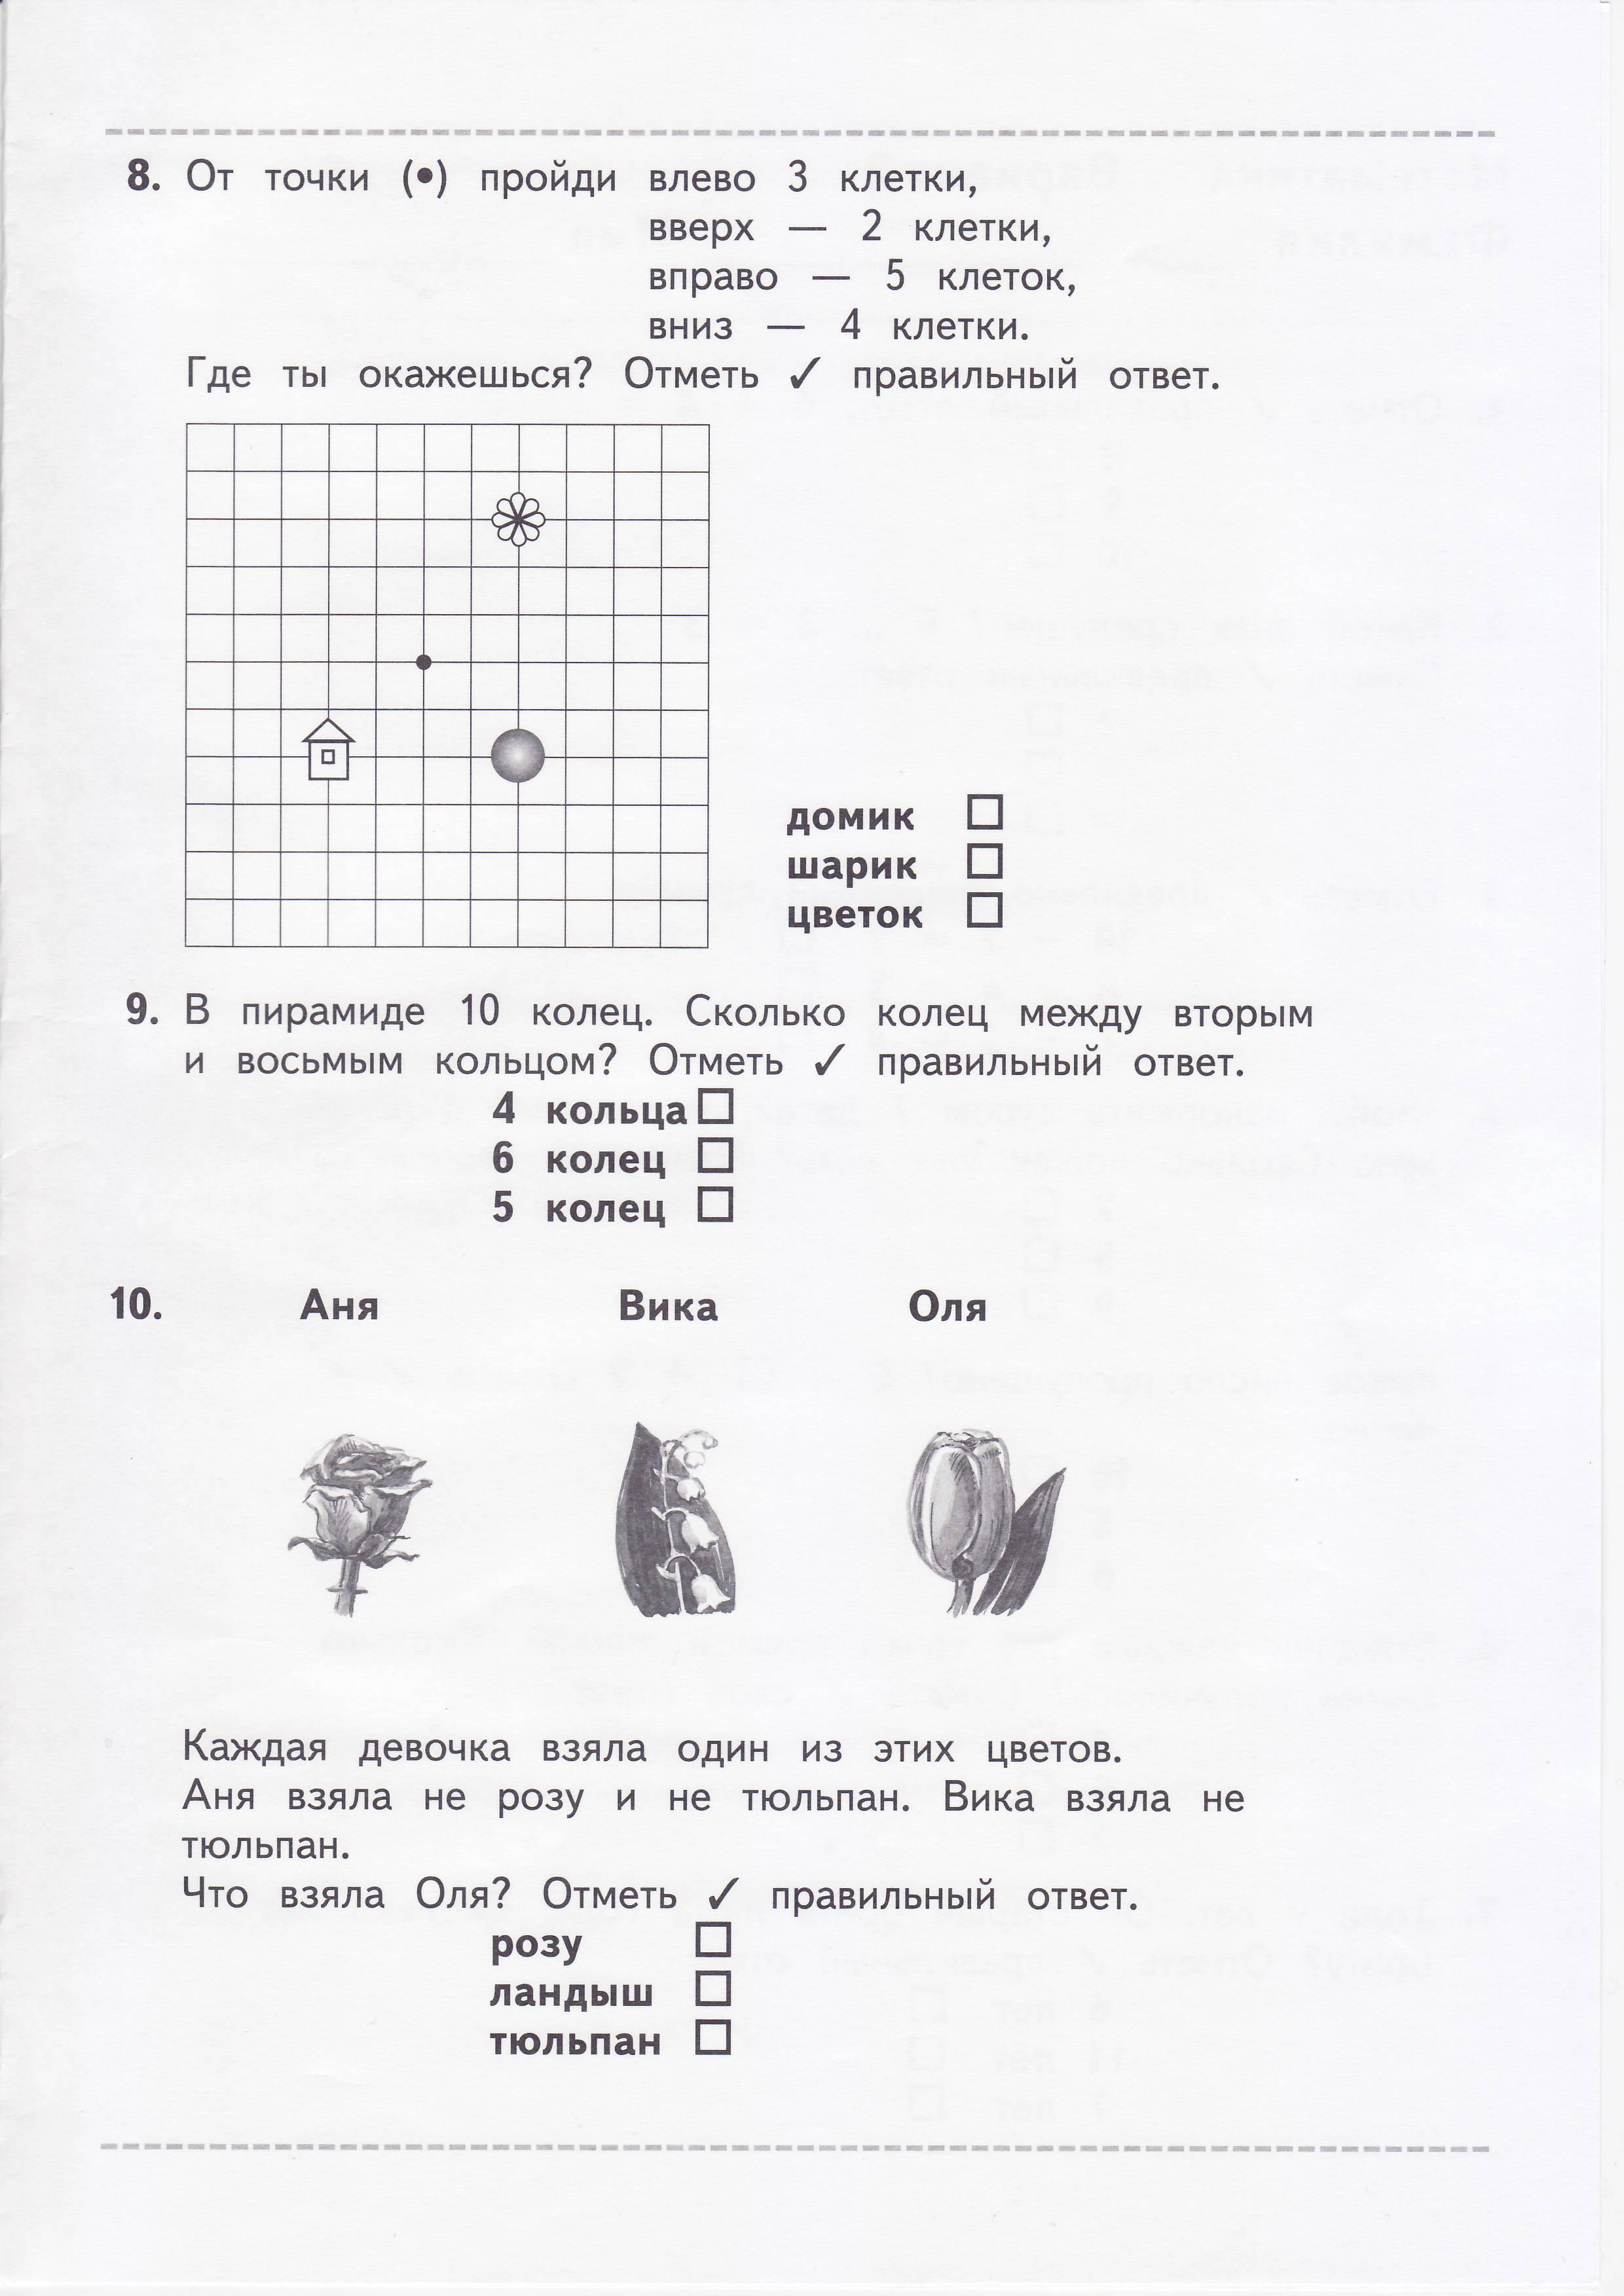 C:\Documents and Settings\Таня\Рабочий стол\2015-09-29\Image0017.JPG